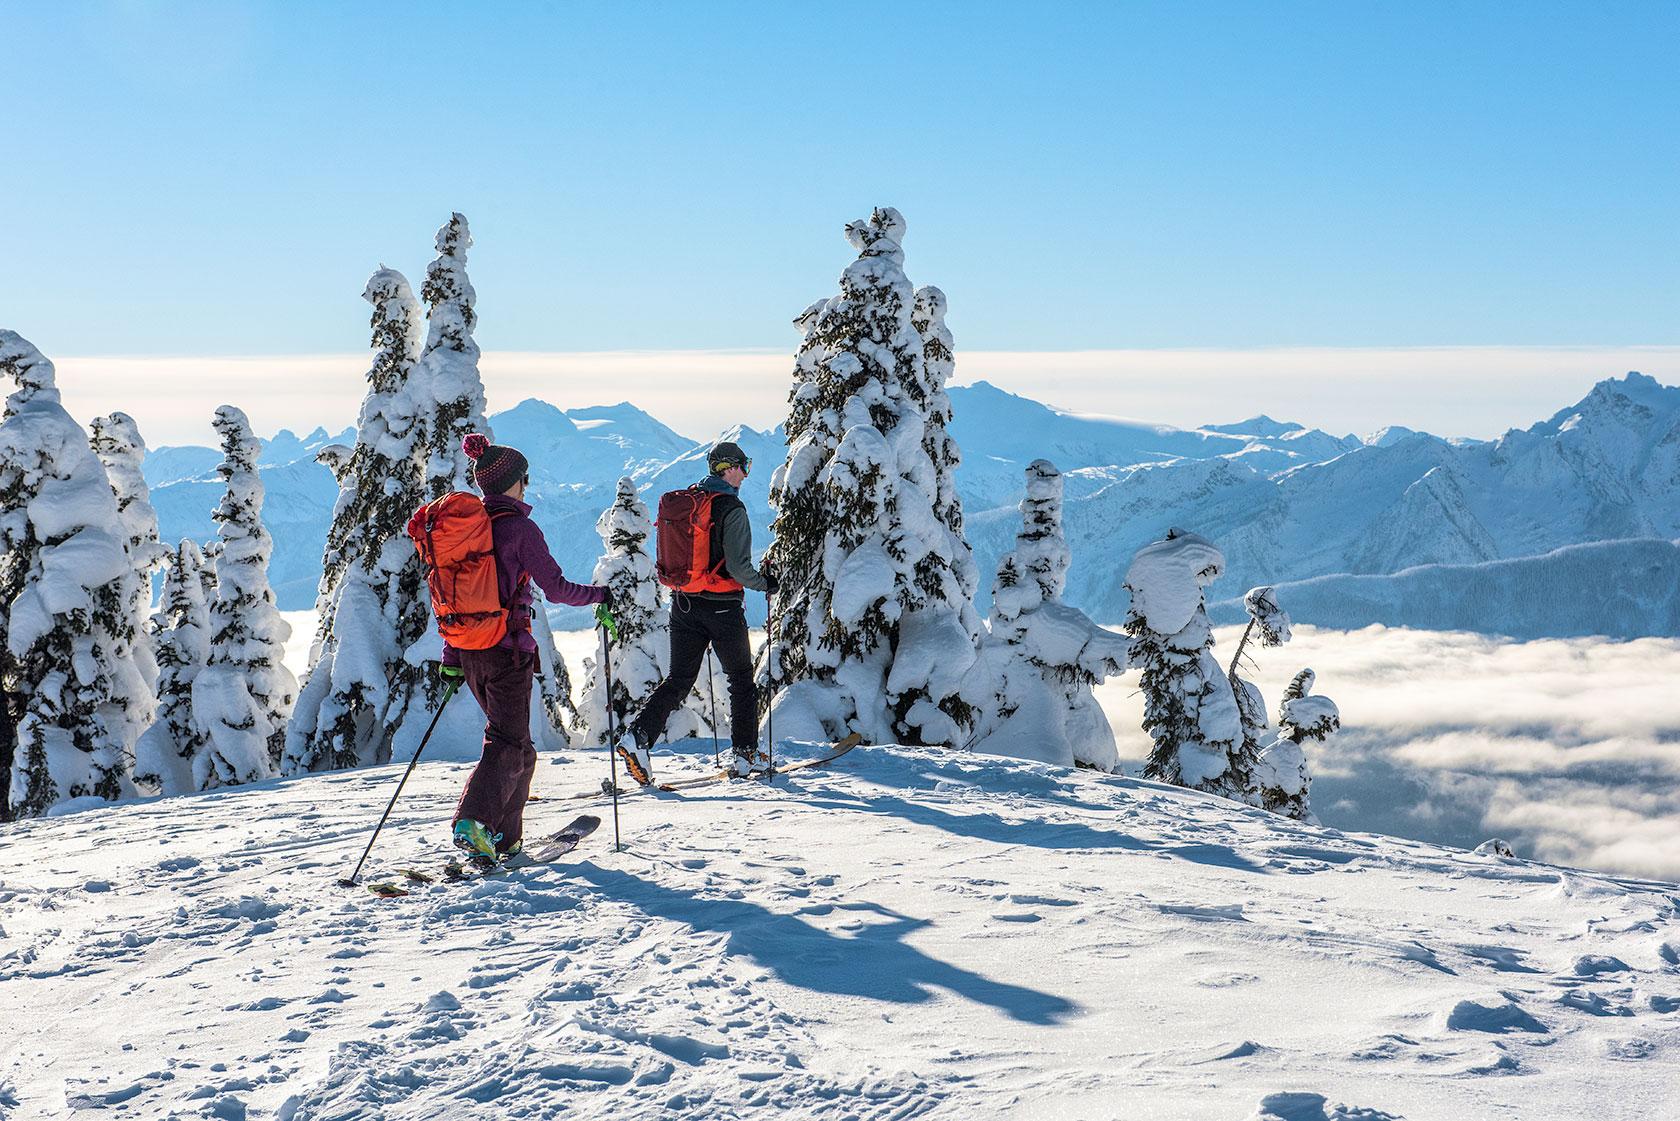 austin-trigg-patagonia-banff-alberta-winter-skin-revelstoke-bc-british-columbia-mountains-valley-snow-skiing-touring-backcountry-adventure-outside.jpg